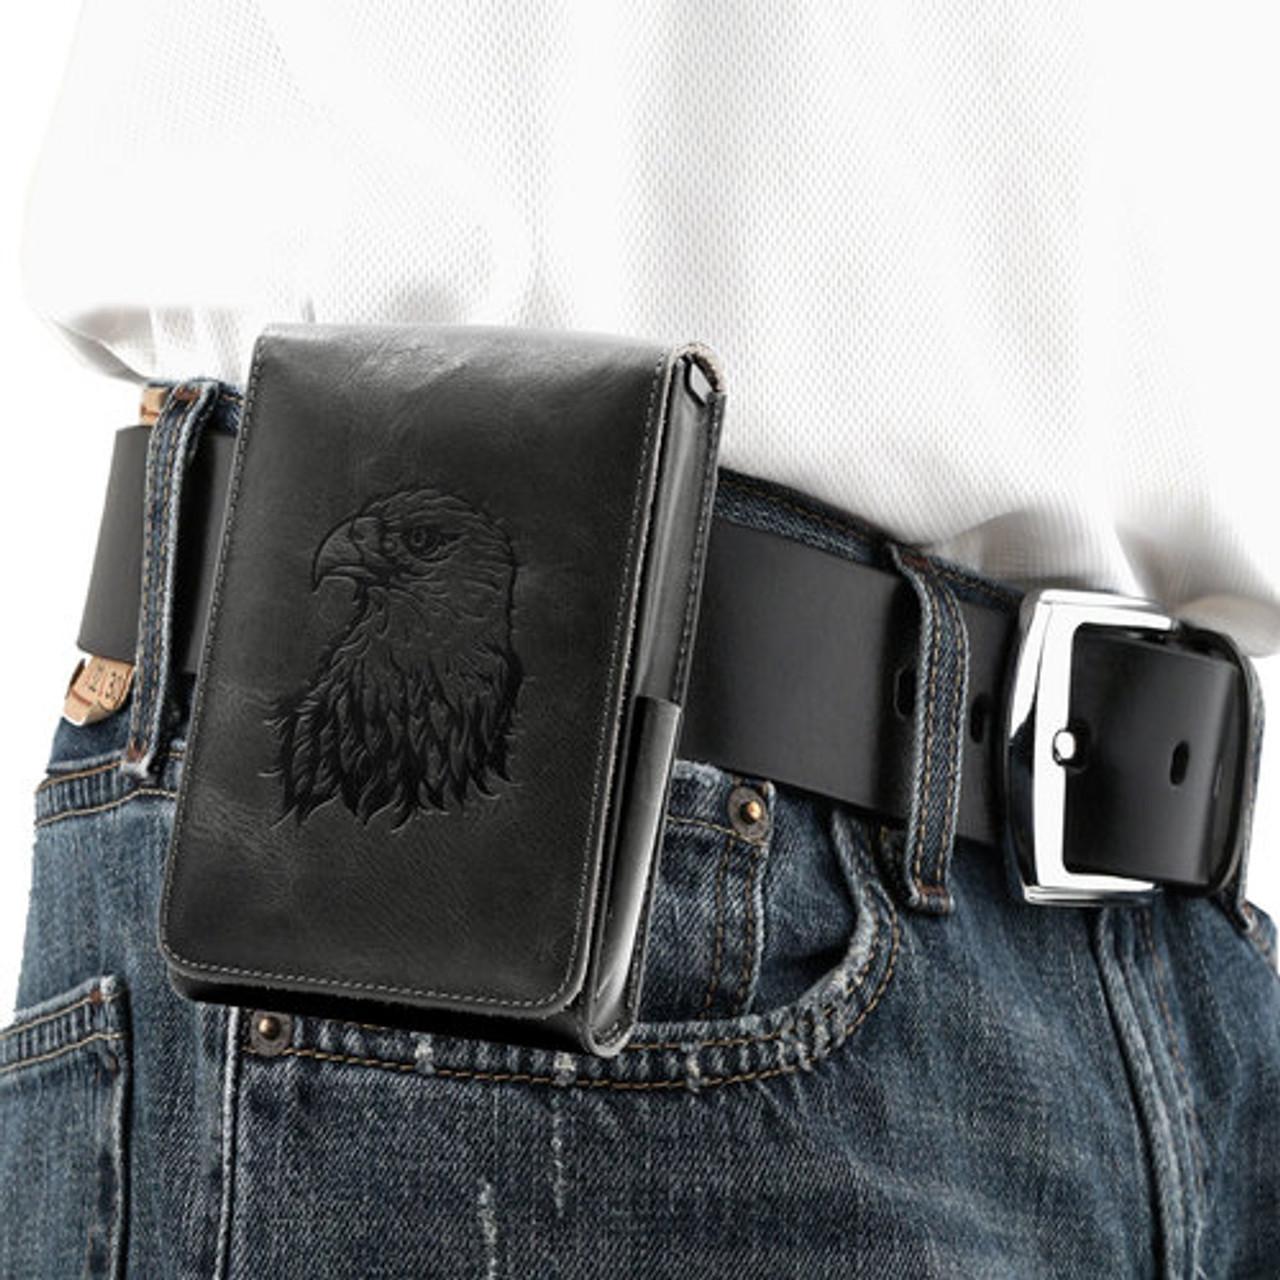 Bersa TPR9c Black Freedom Series Holster